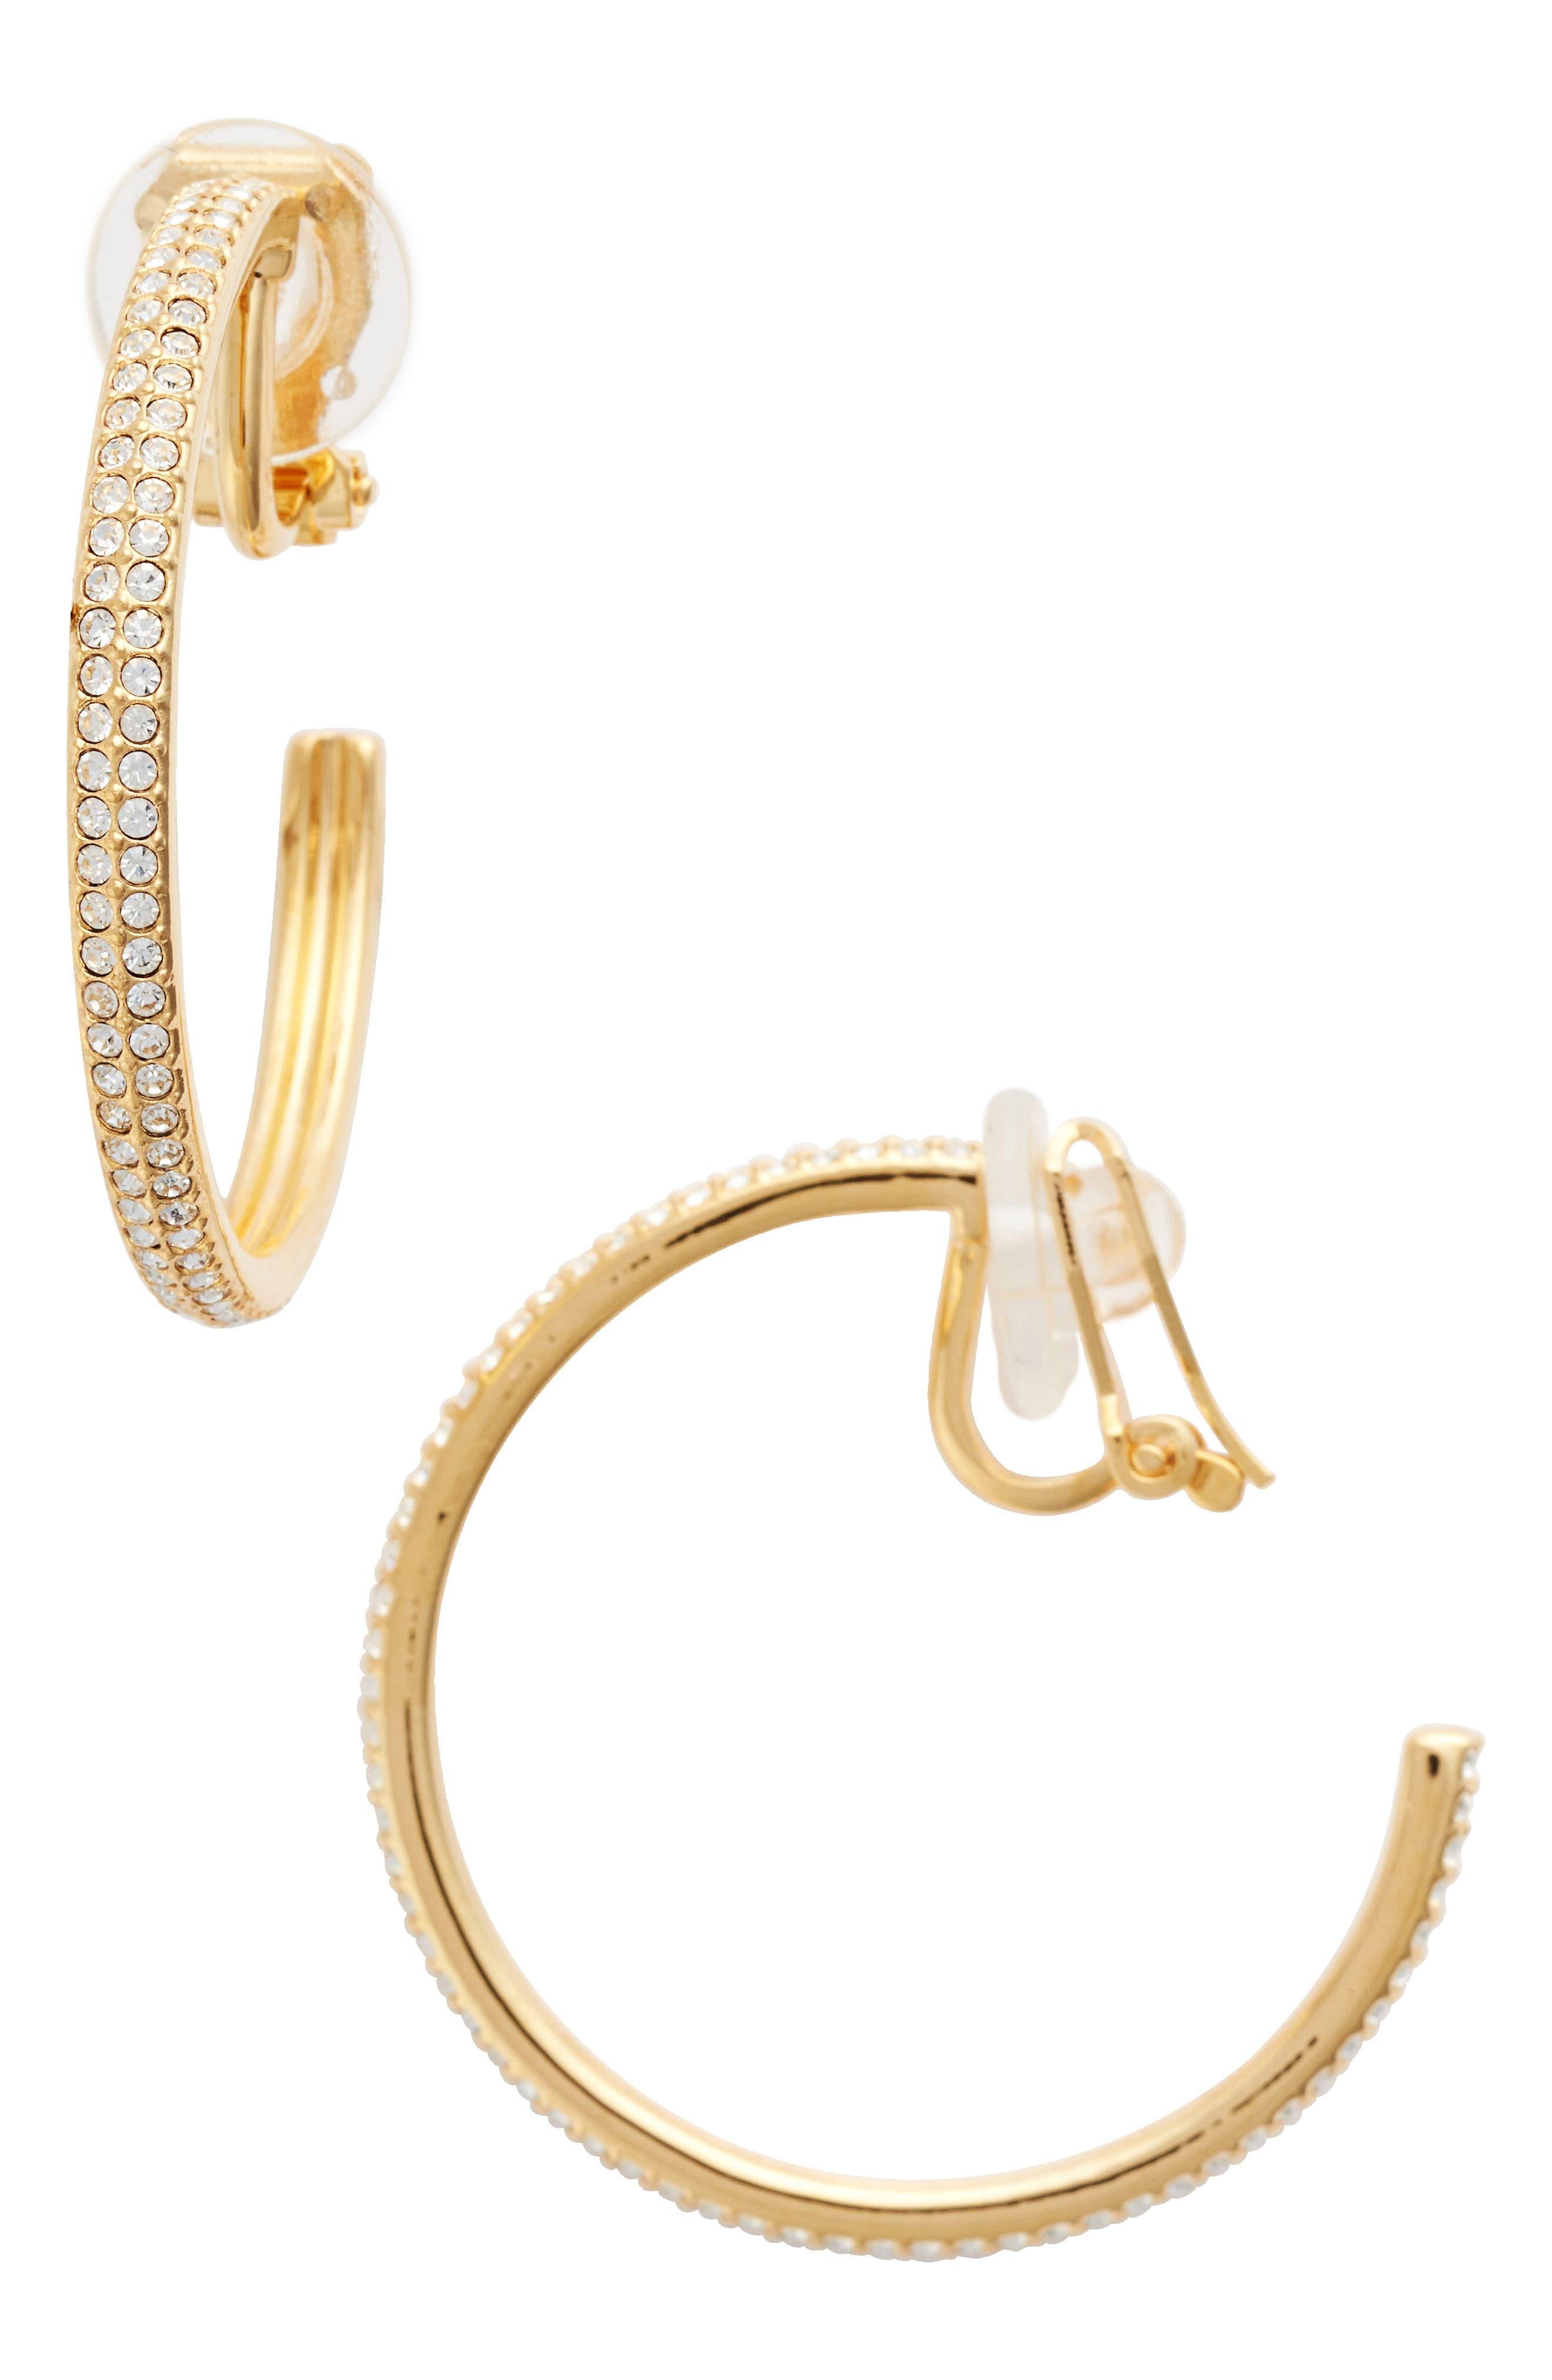 Clip-On Hoop Earrings,                         Main,                         color, Gold